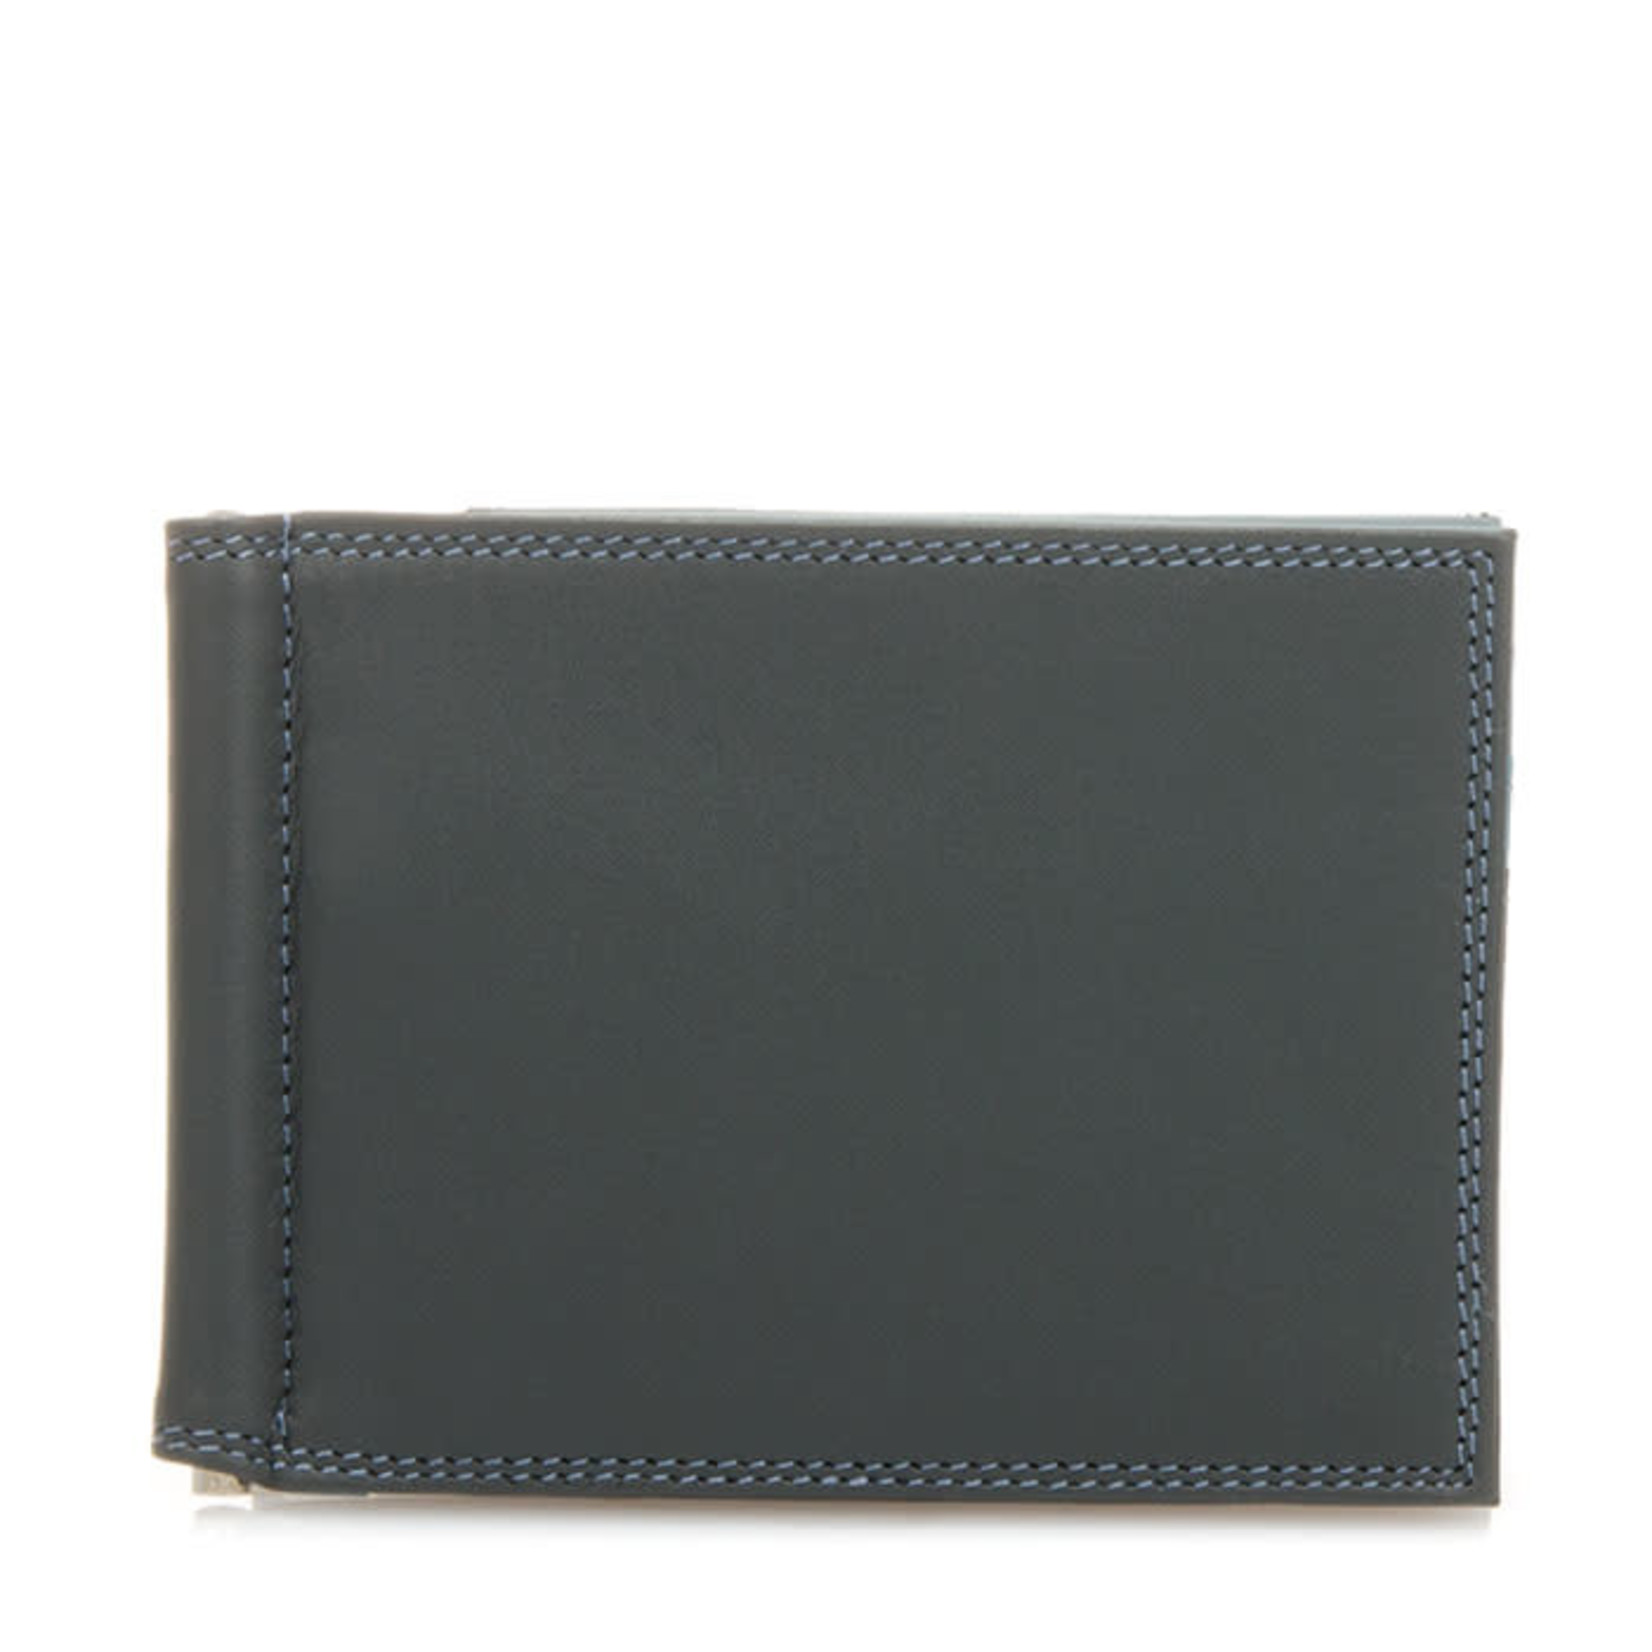 MyWalit Money Clip Wallet Smokey Grey